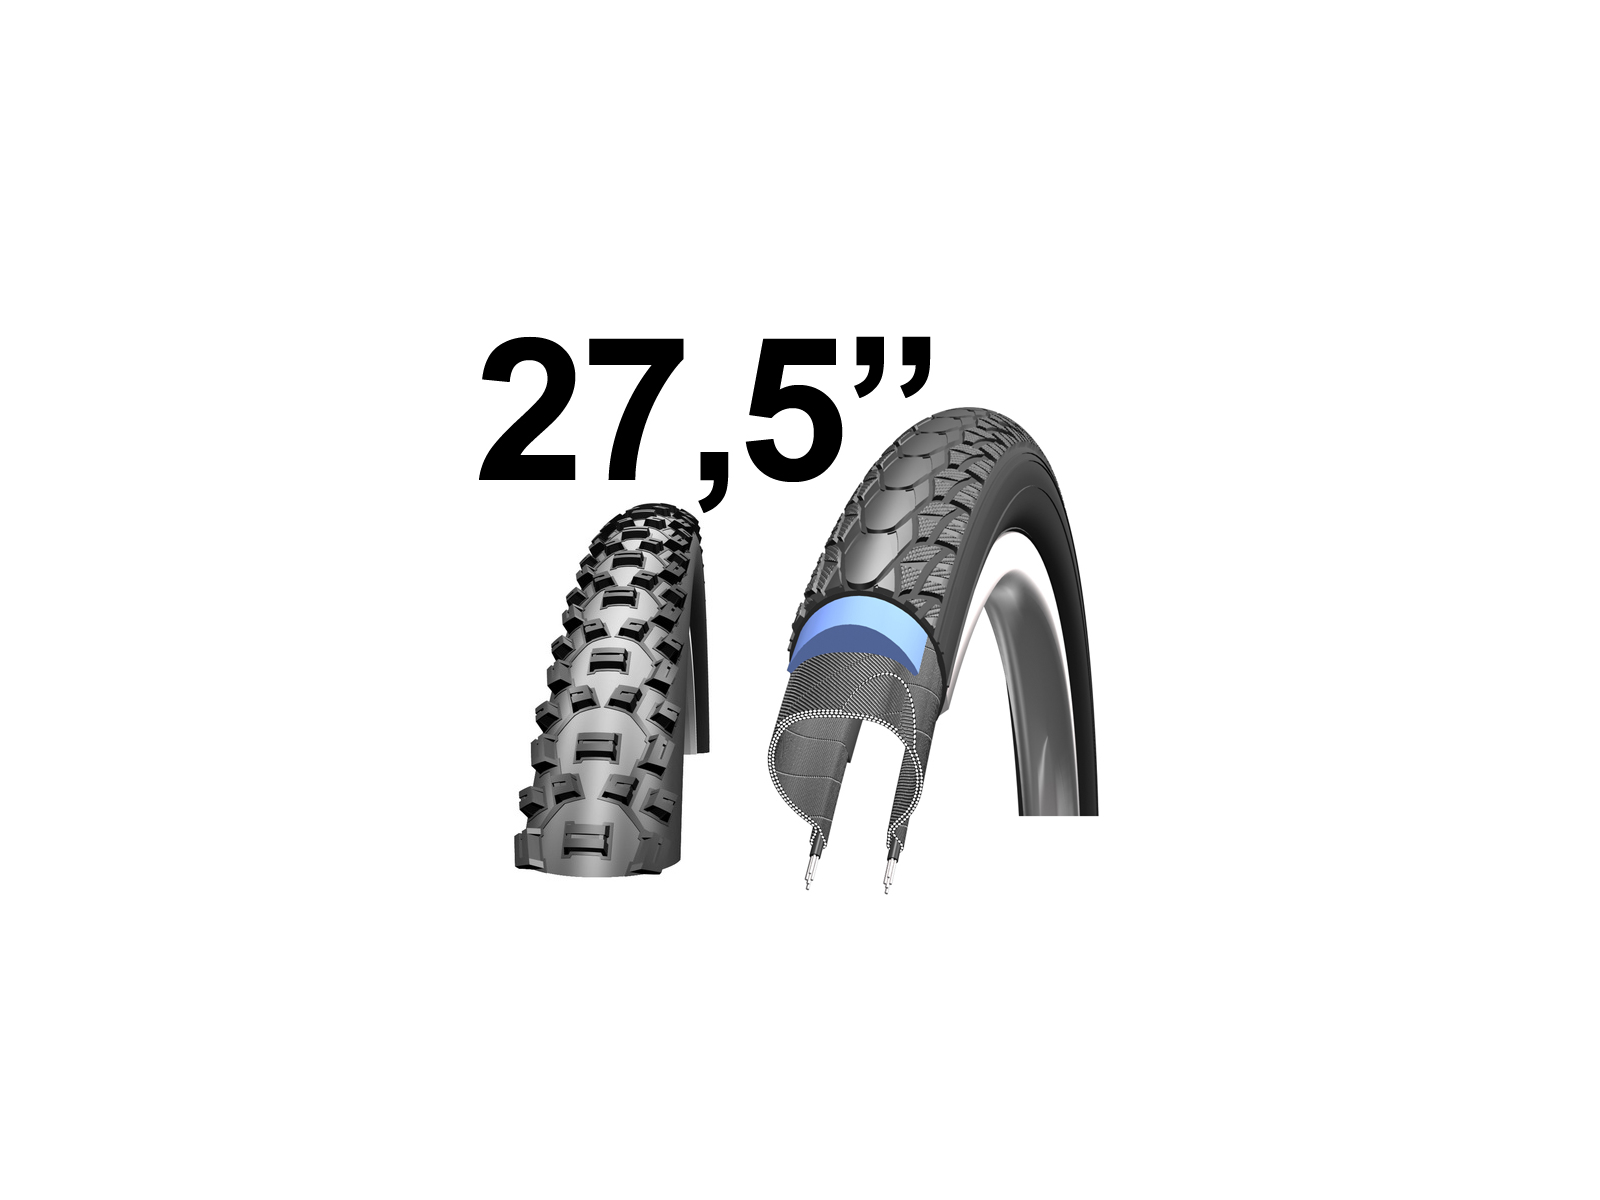 "Kanttrådsdæk til MTB cykler 27,5"" / 650B"